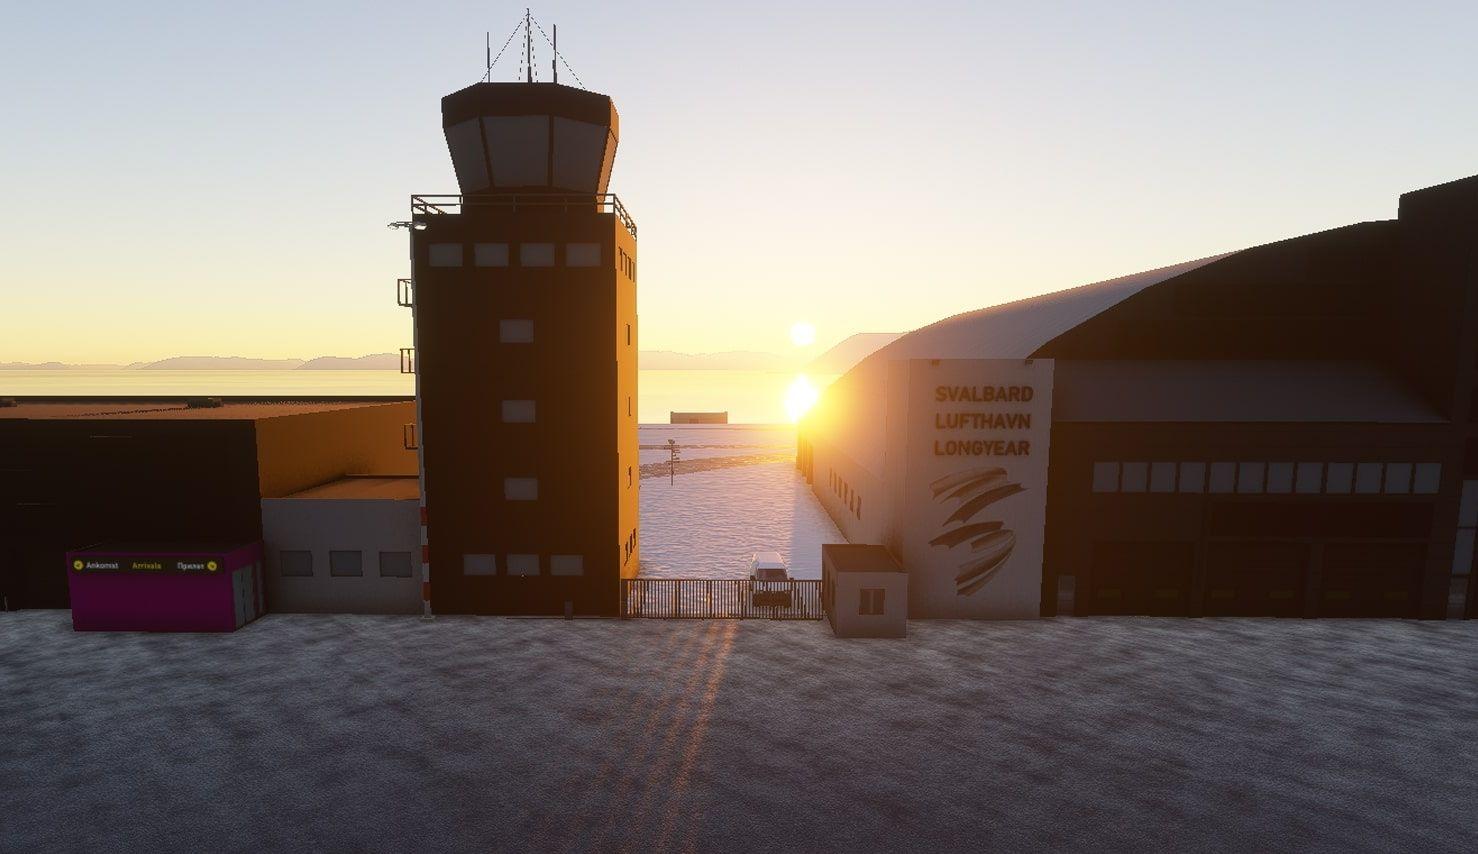 MSFS ENSB Svalbard